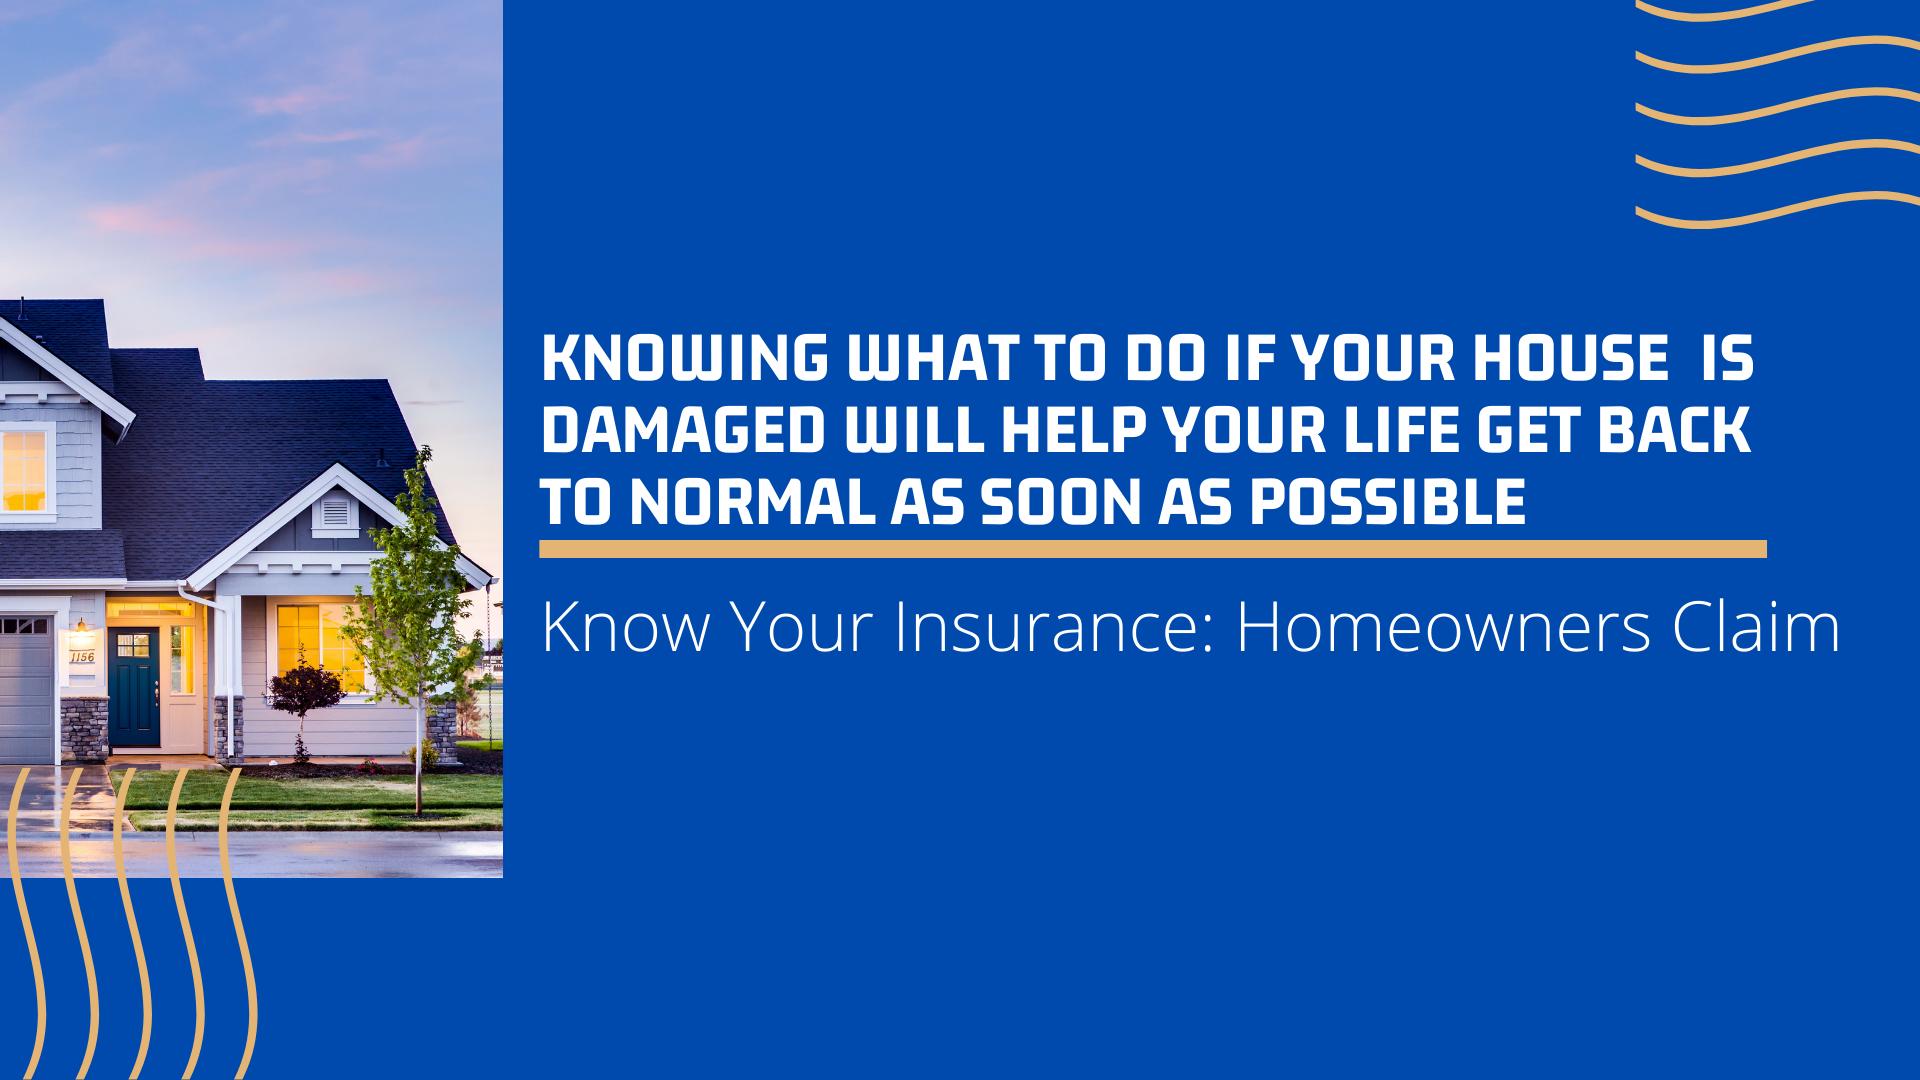 https://schwarzins.com/sites/schwarzins.com/assets/images/default/Know-your-insurance-homeowners-claim.png